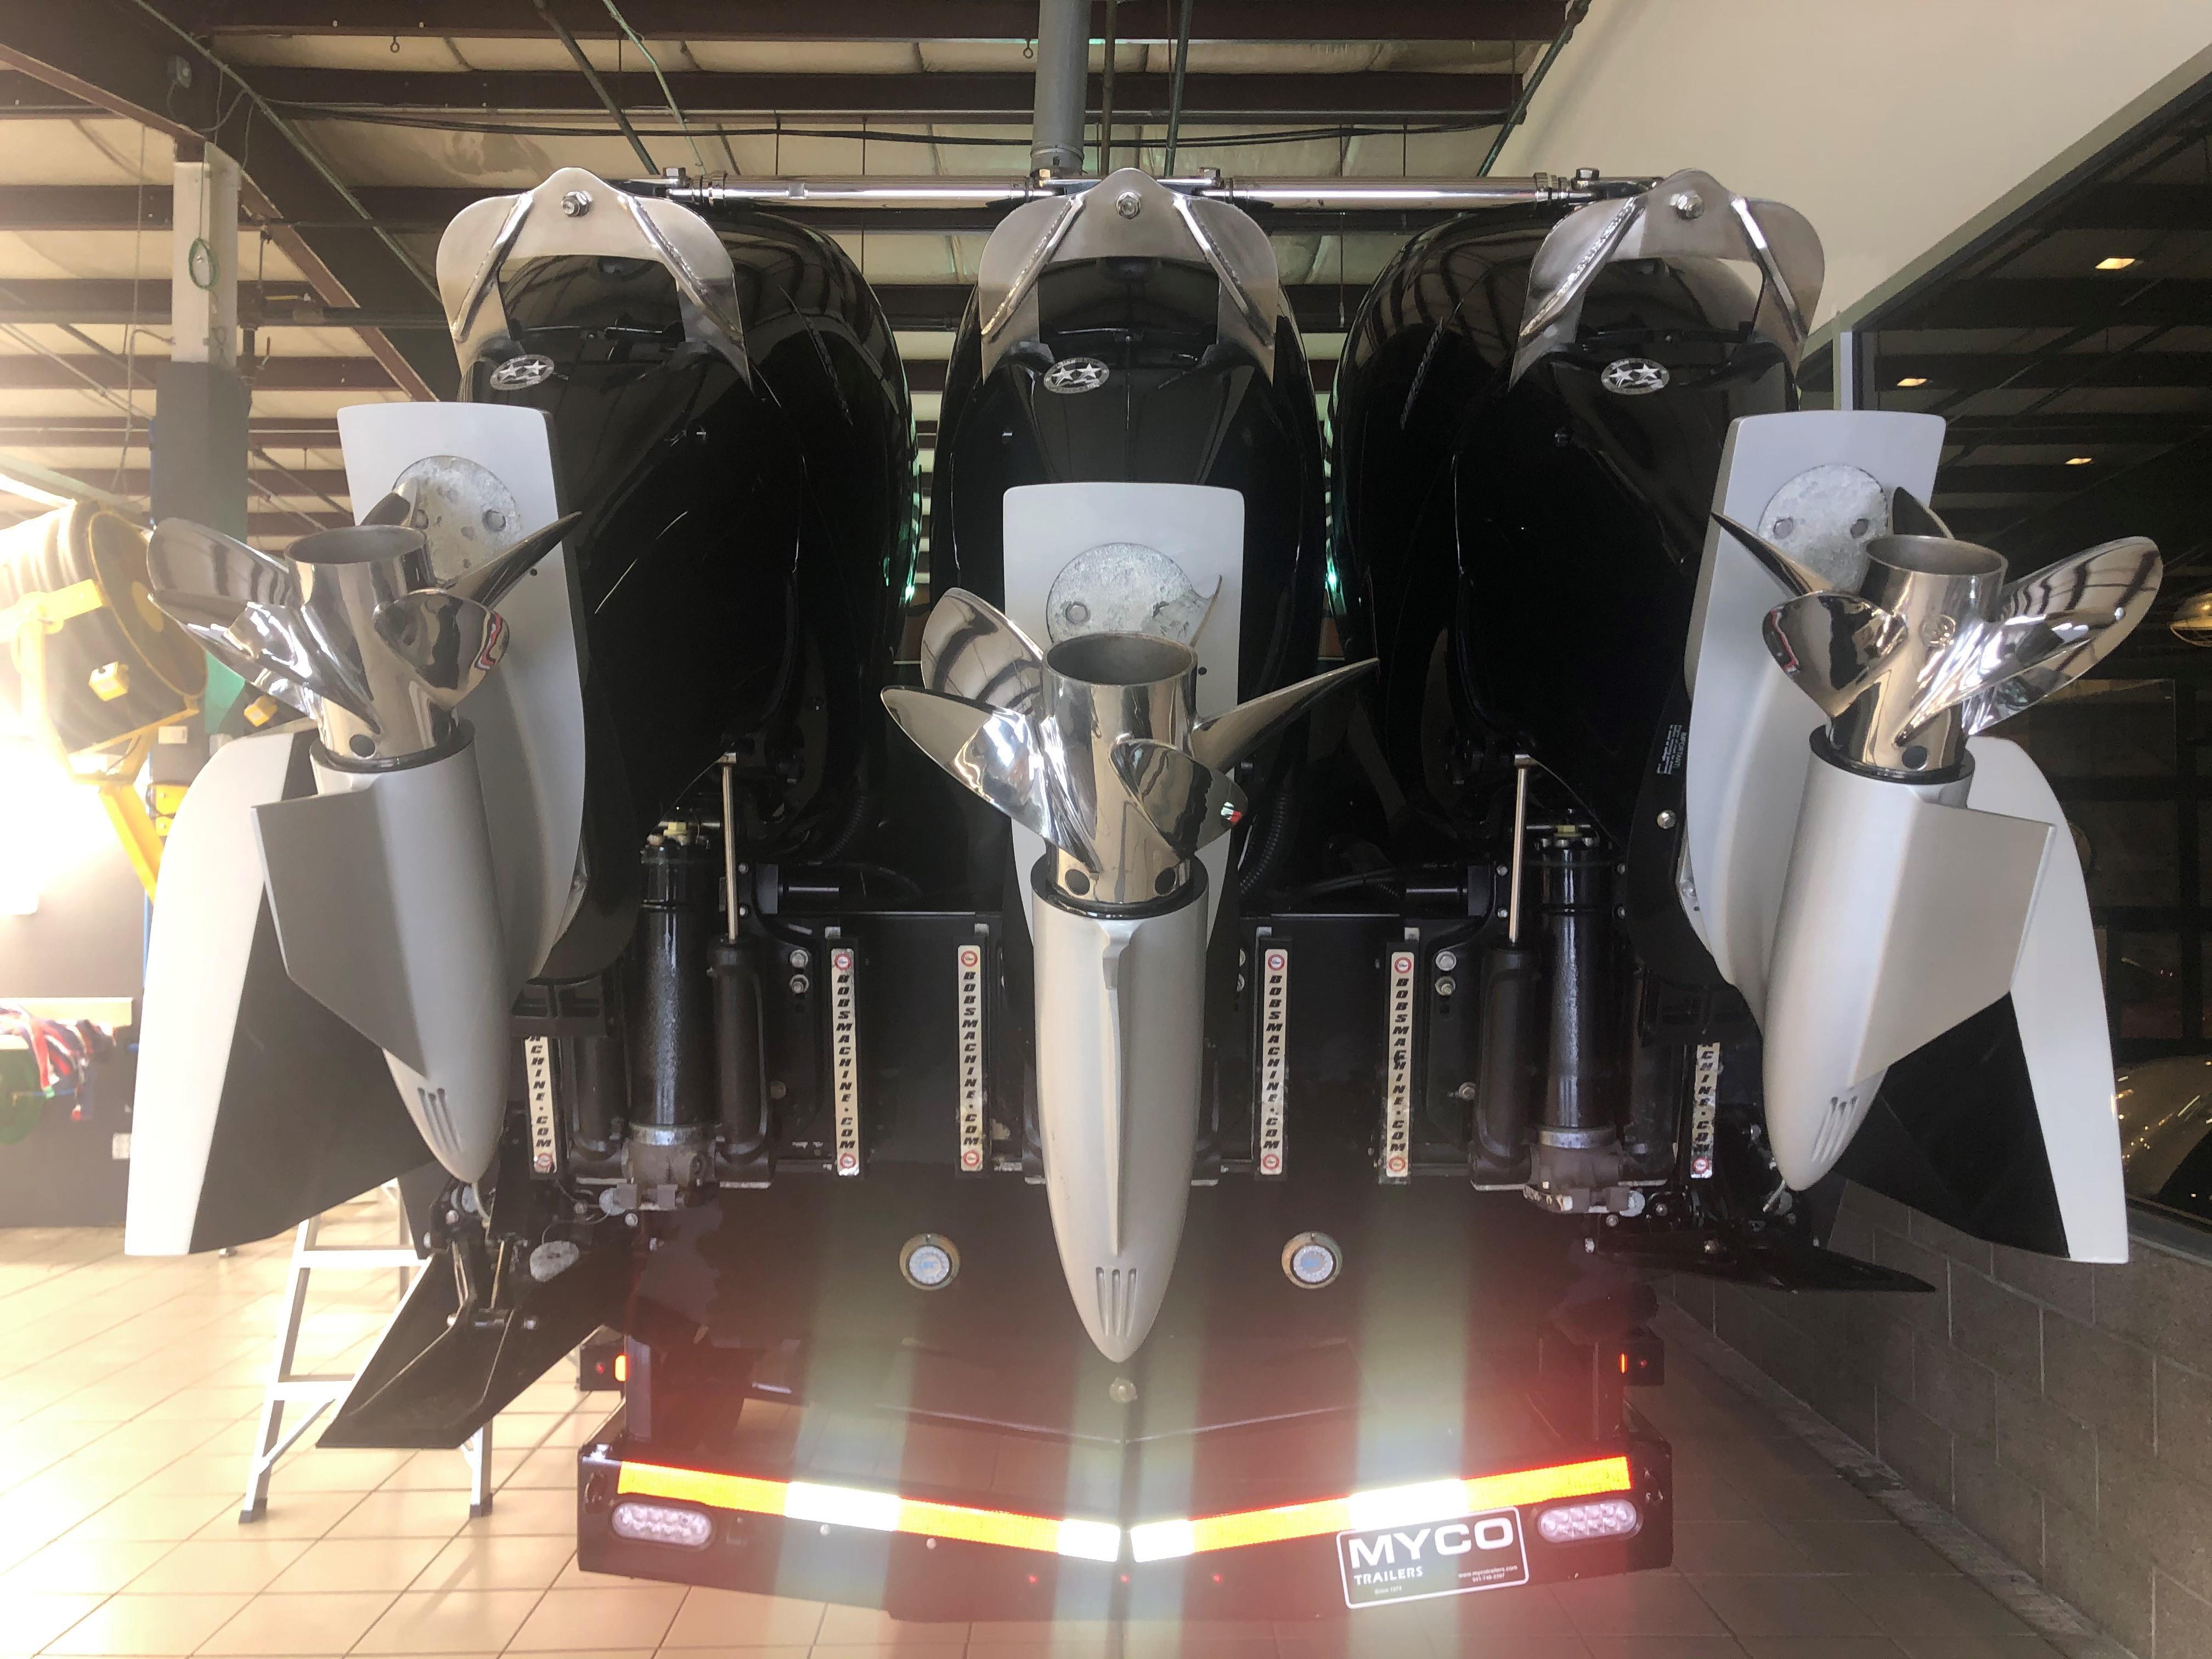 Triple Mercury 400R Outboards